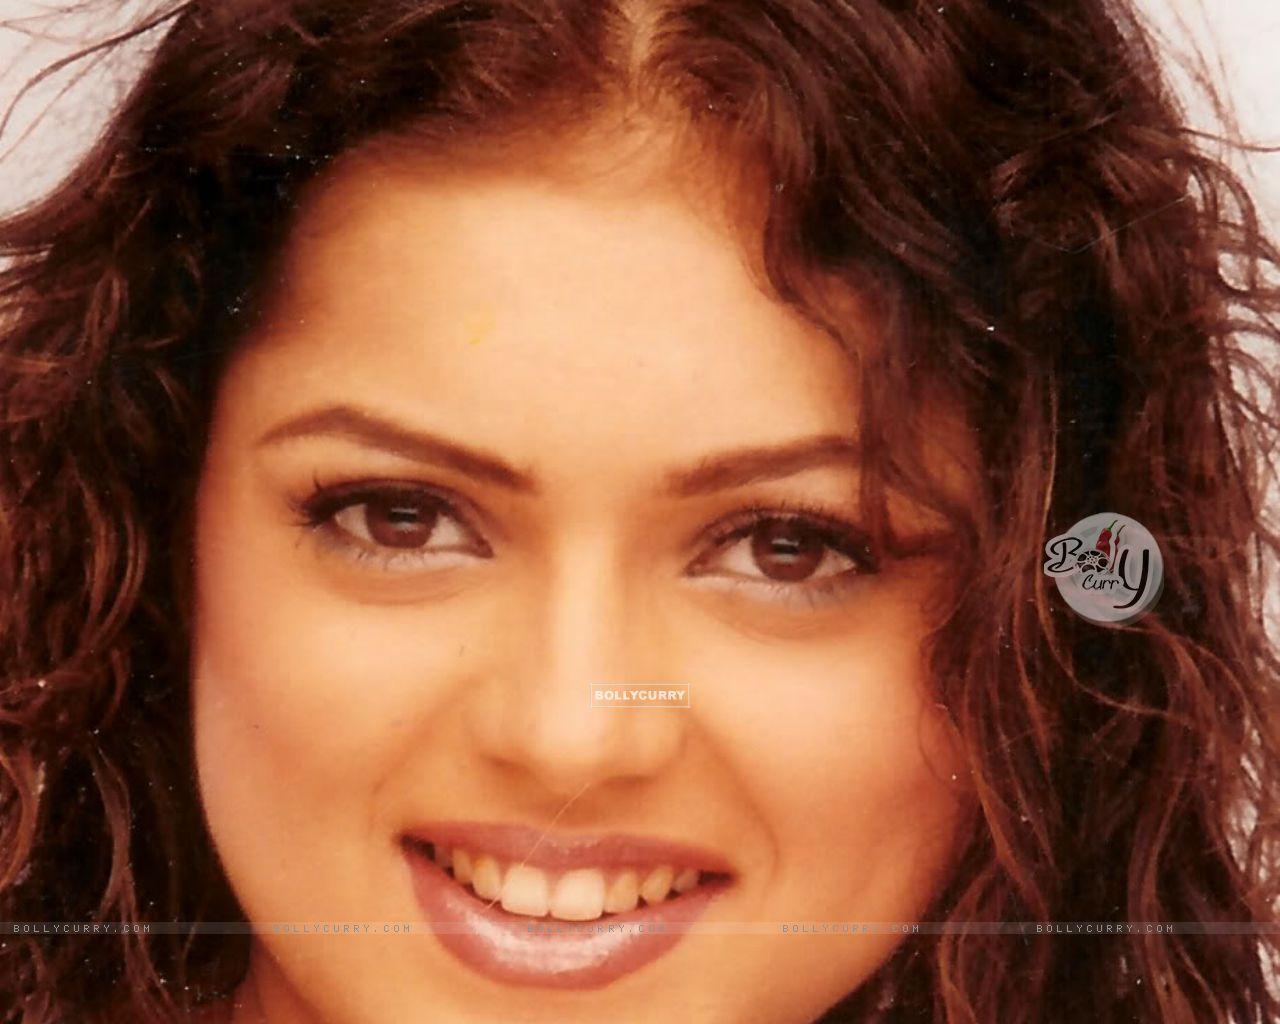 Download 1280x1024 Wallpaper Size Image Of Celebrity Drashti Dhami